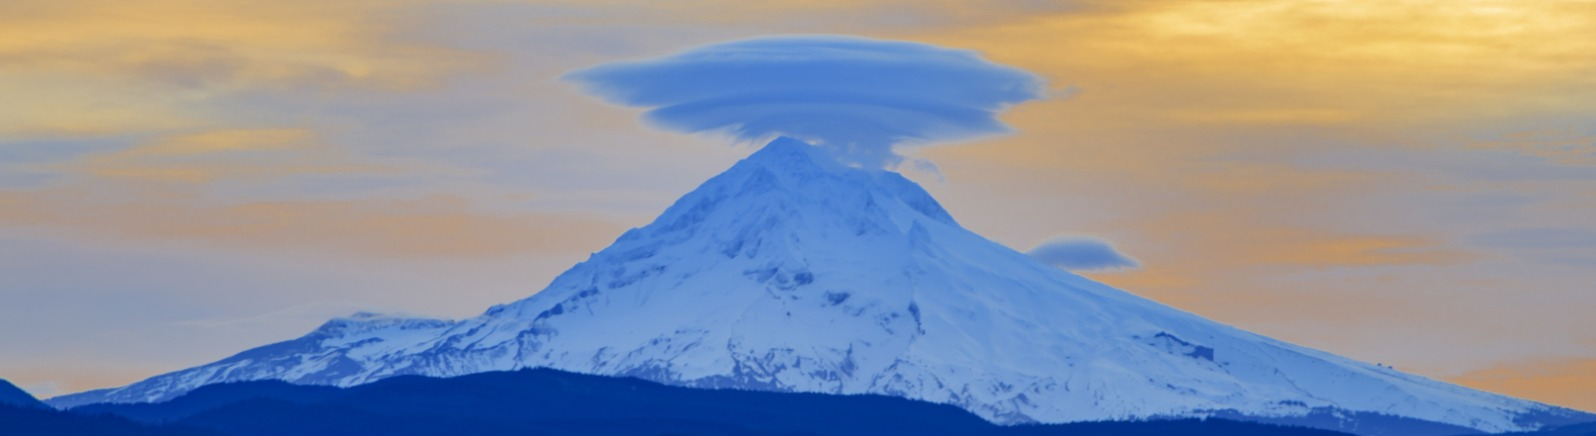 Lenticular Cloud Hovering of Mt Hood at Sunrise